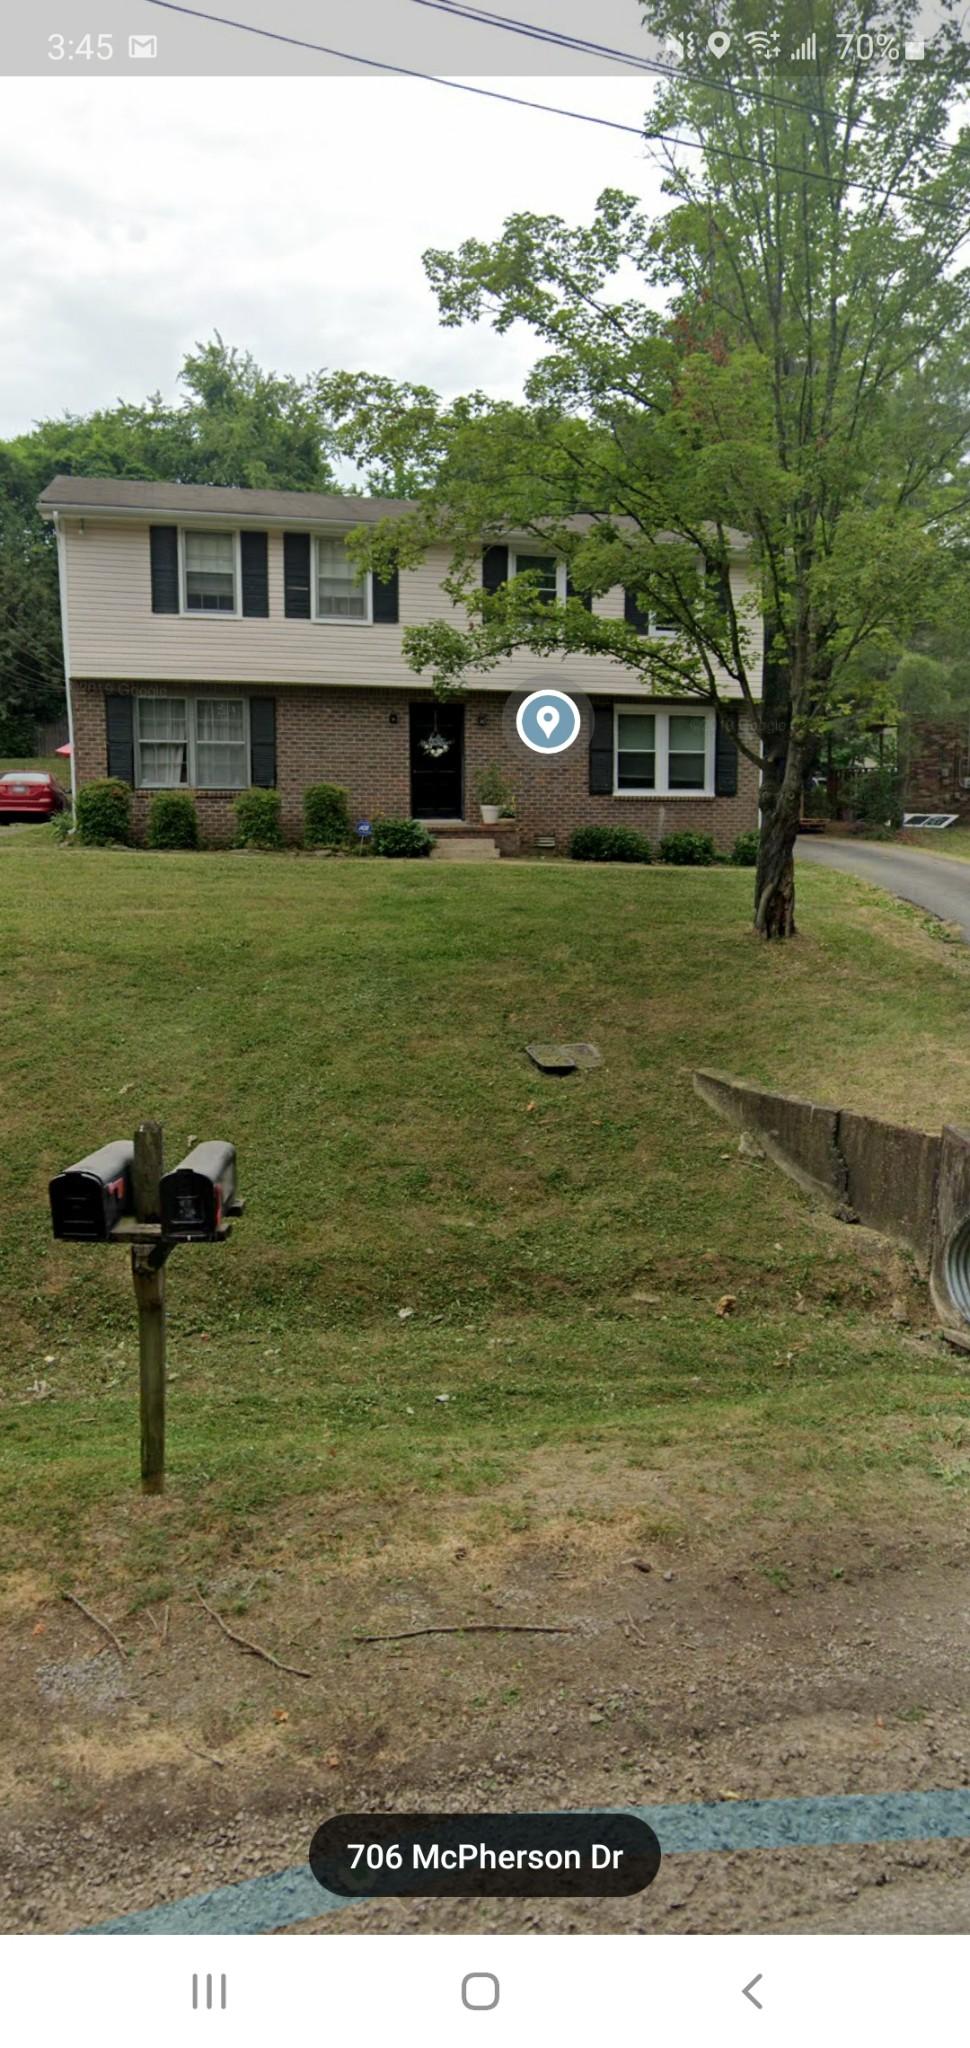 739 McPherson Dr Property Photo - Nashville, TN real estate listing